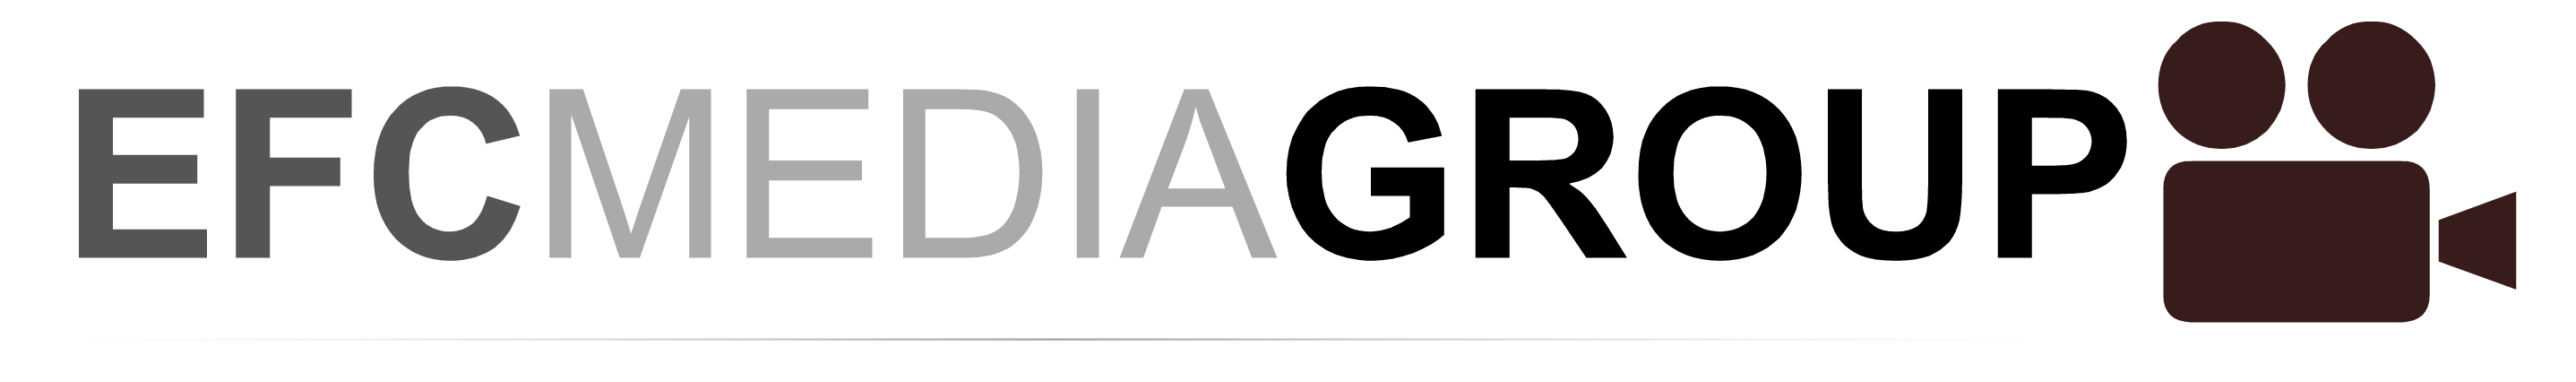 EFC Media Group